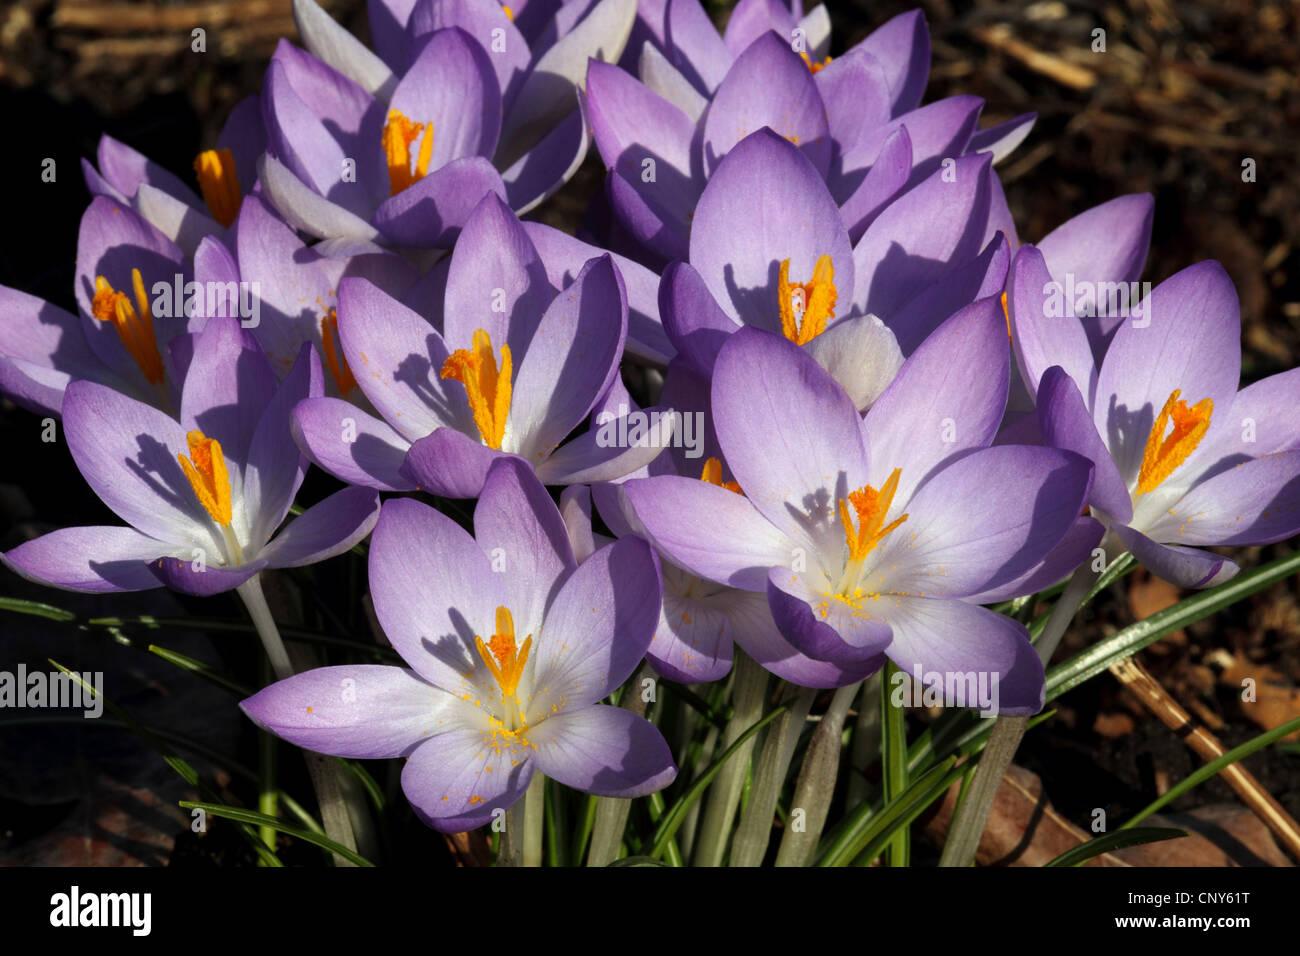 Early Crocus (Crocus tommasinianus), blooming - Stock Image